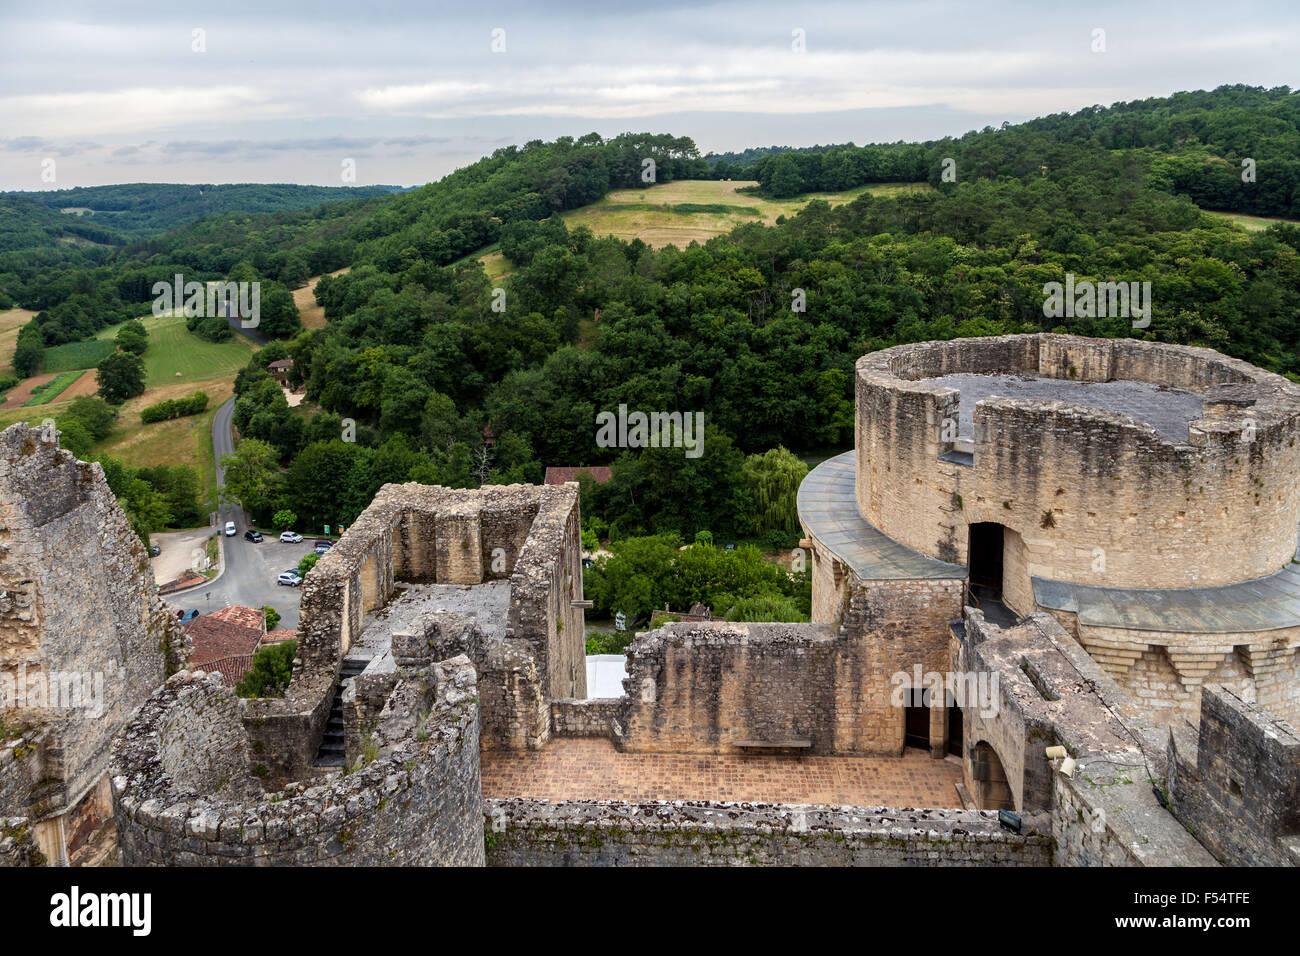 Historic architecture Bonaguil Castle Fumel France, military viewpoint. - Stock Image